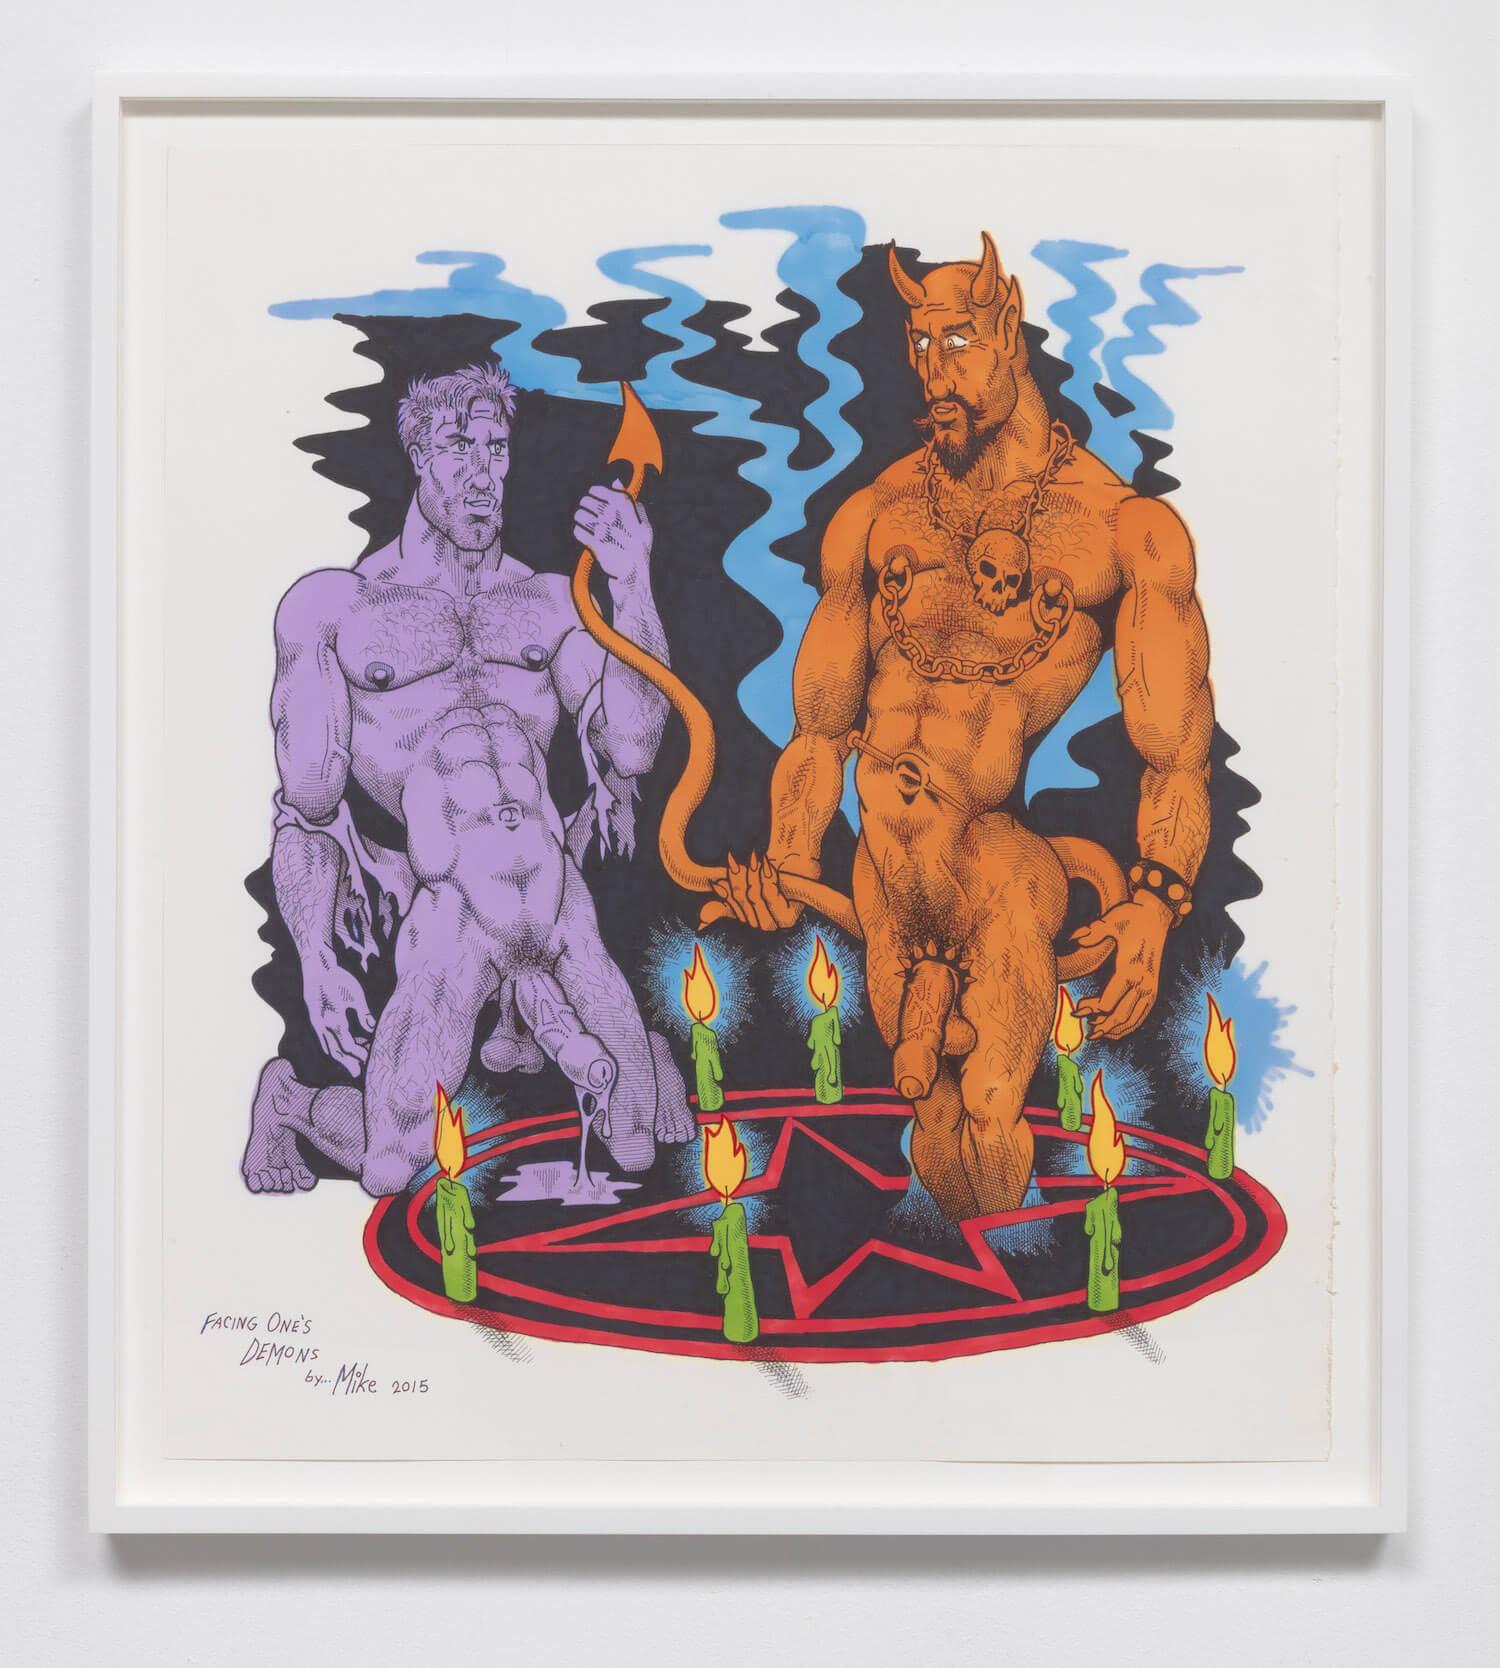 Kuchar, Facing One's Demons, 2015 (MK 15.003) A